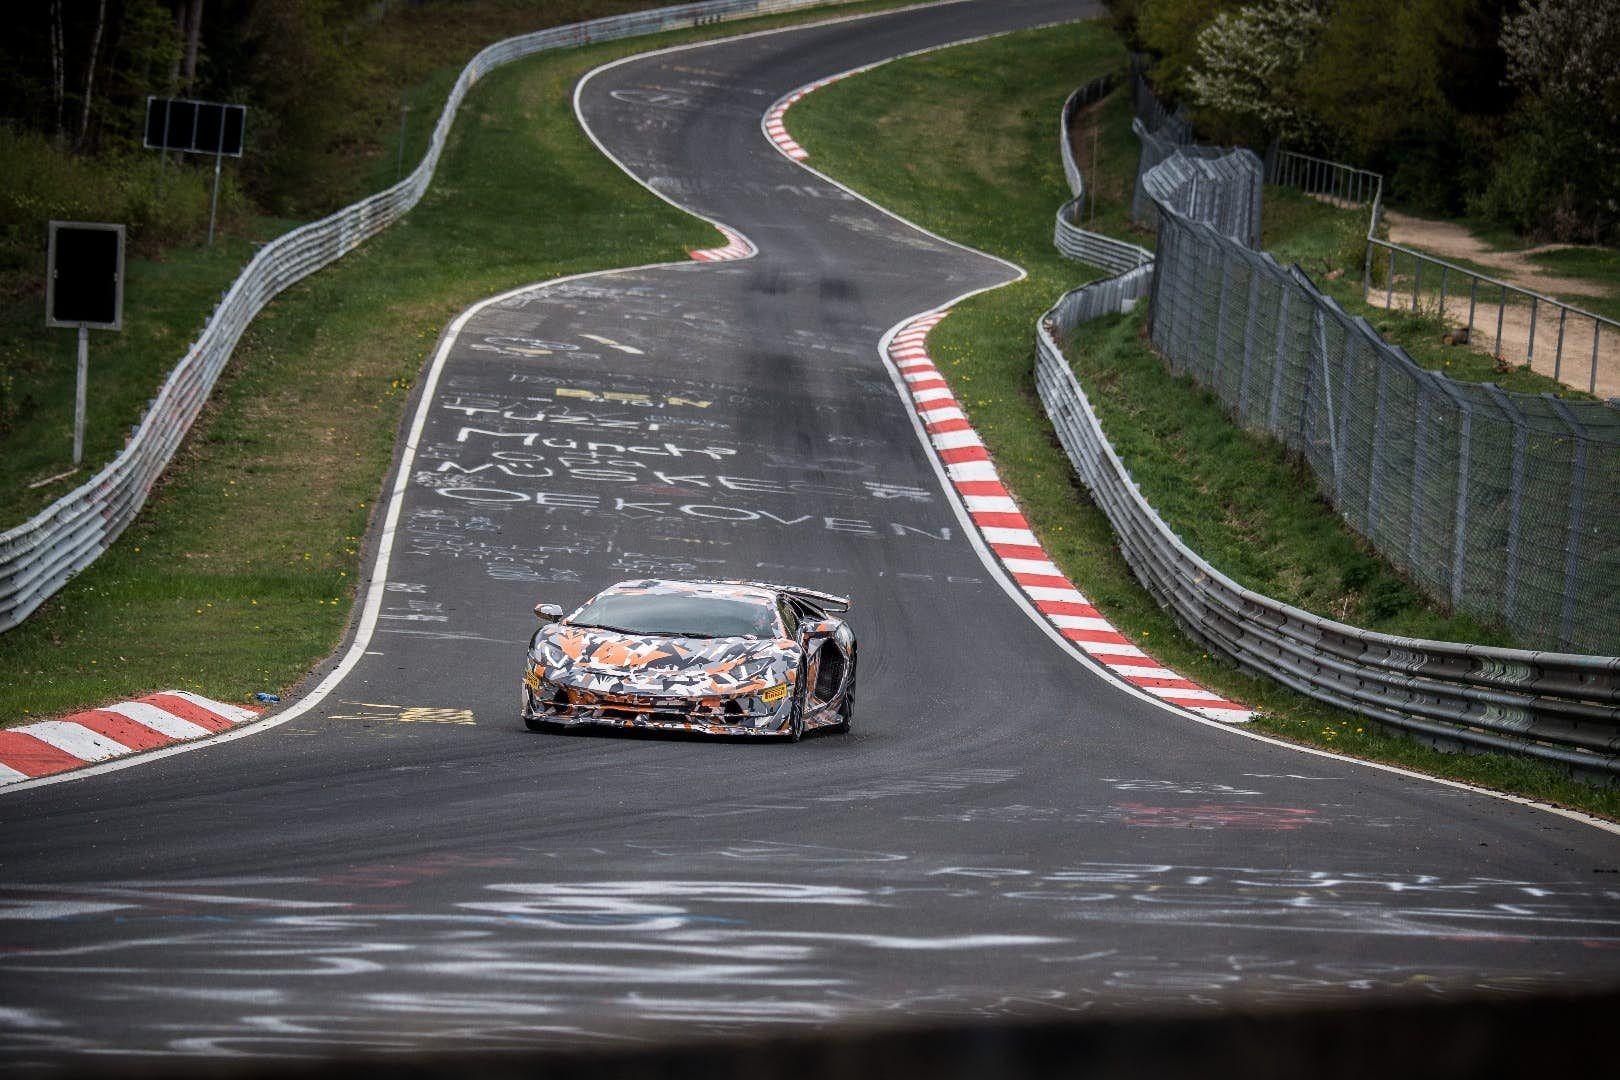 Lamborghini Aventador Svj Takes Lap Record At Nurburgring